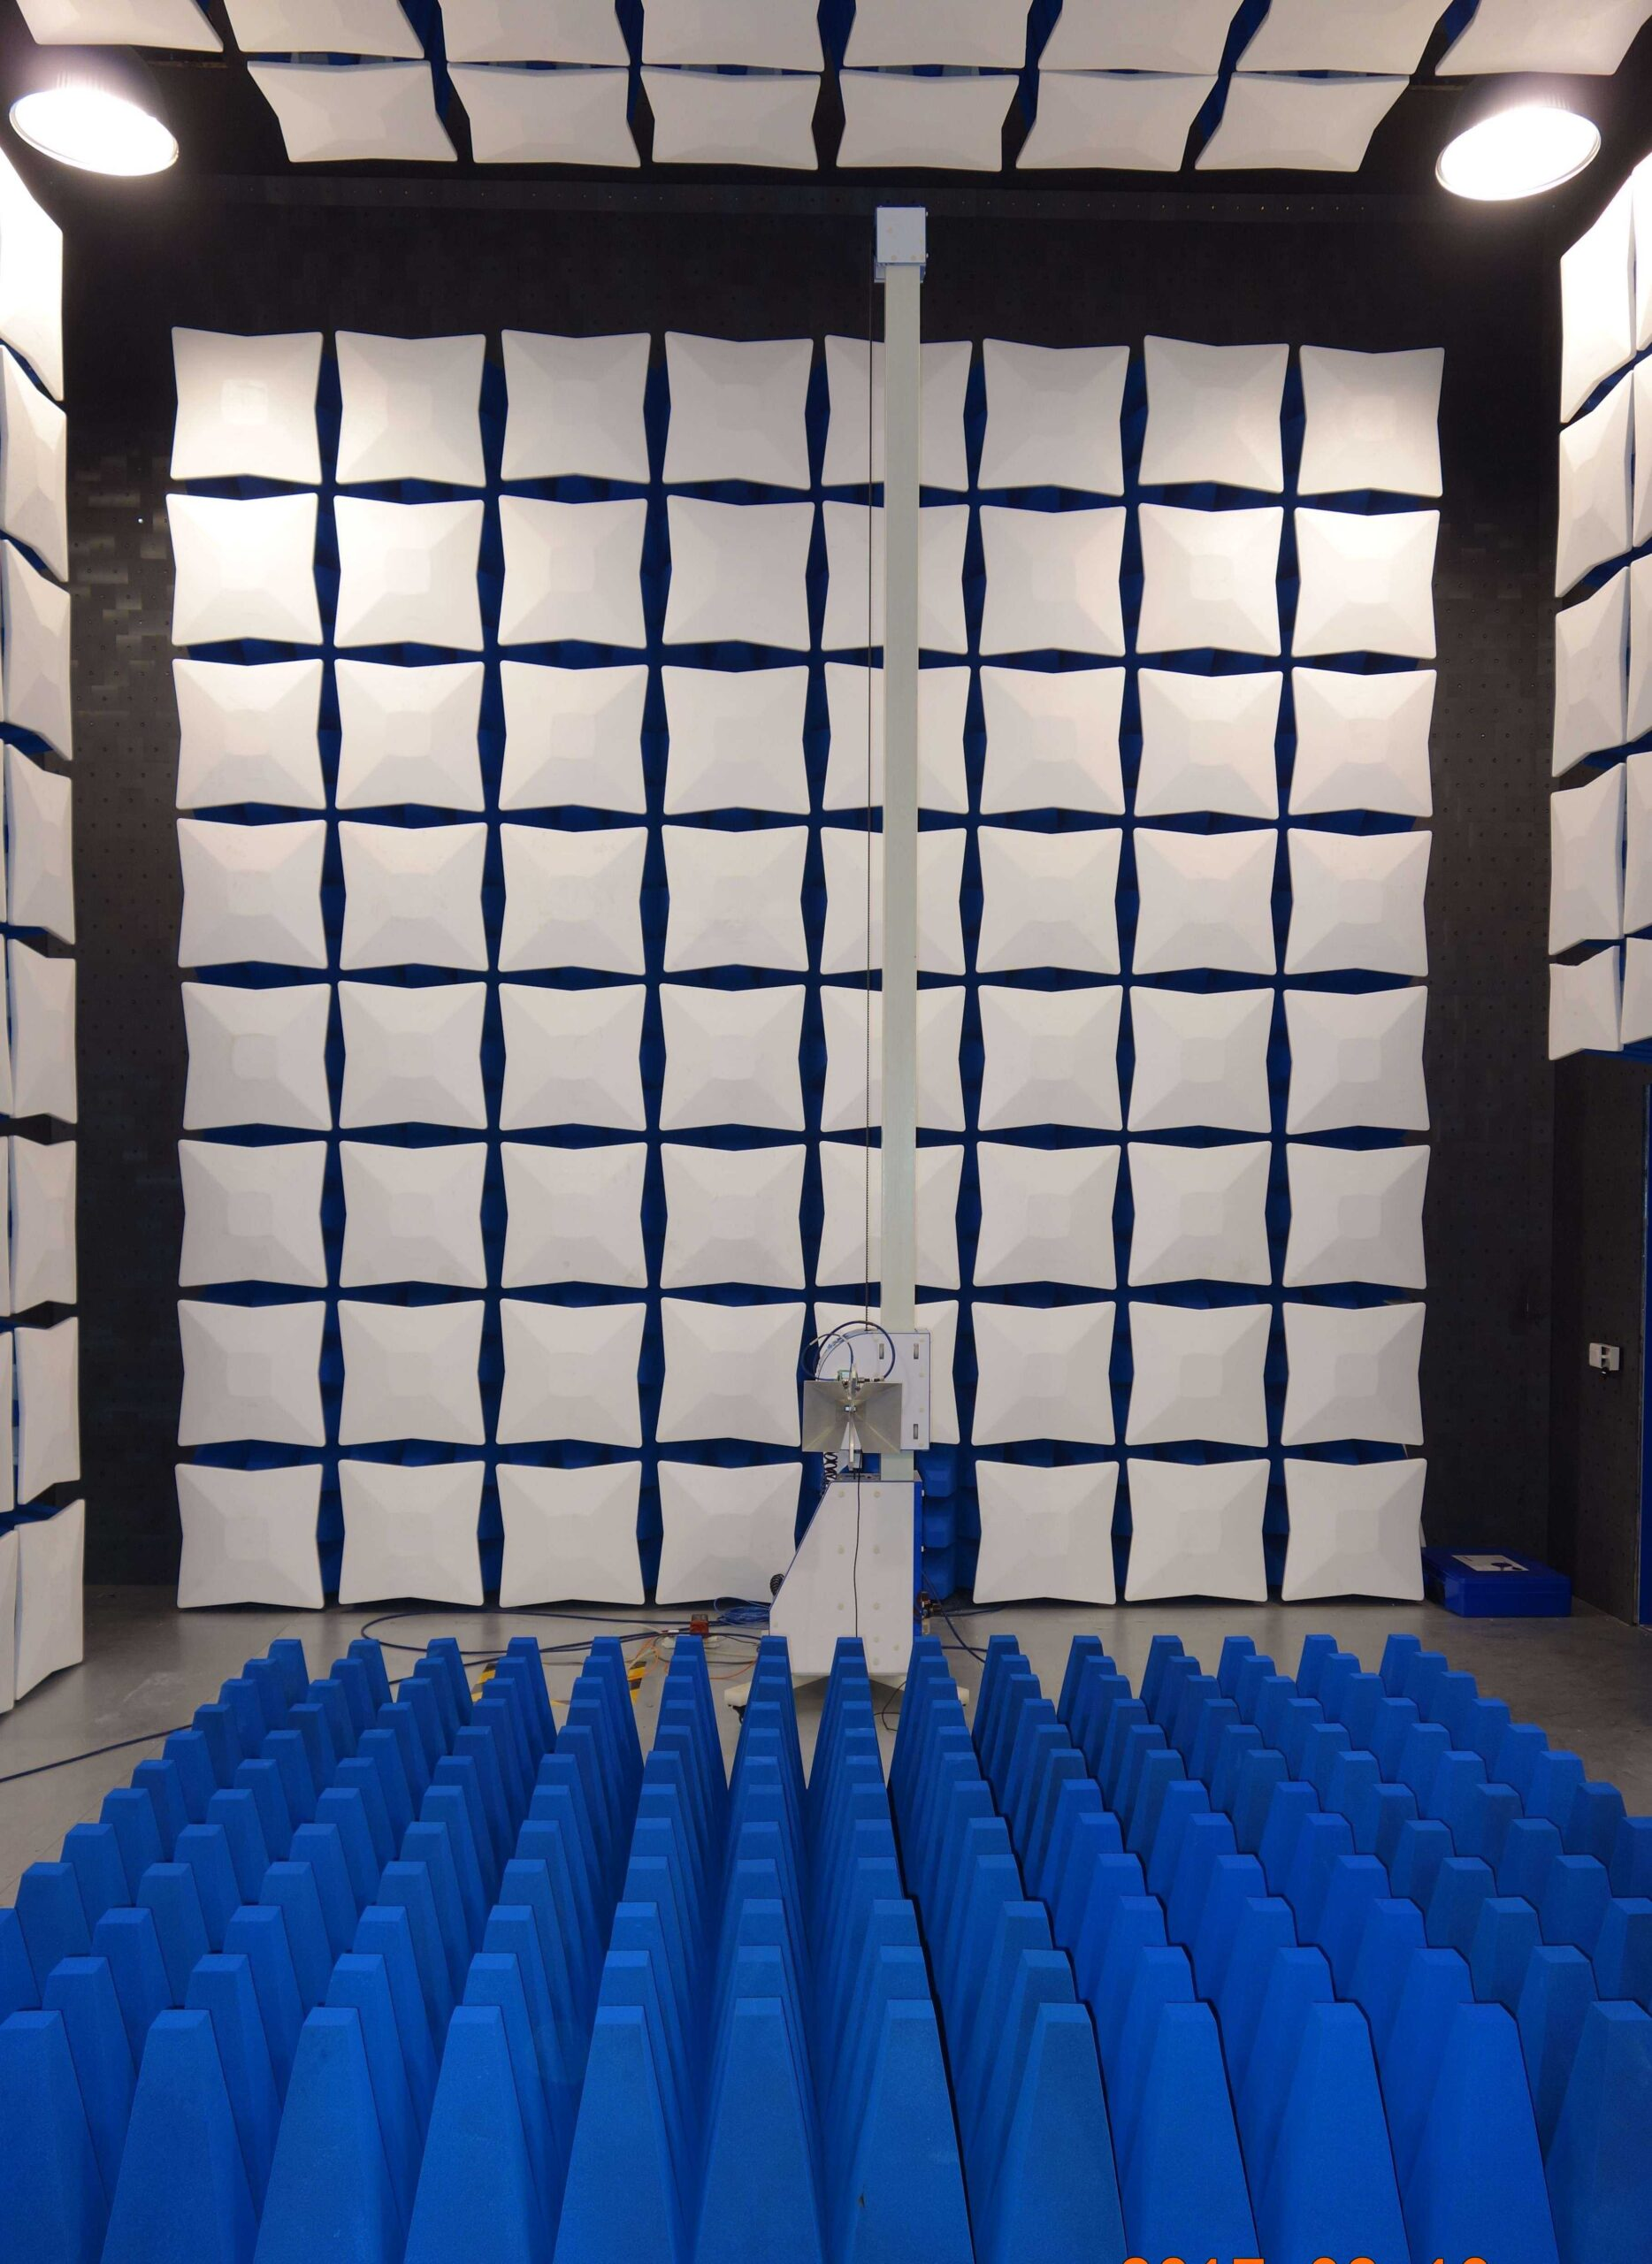 3meter EMC Fully Anechoic test chamber